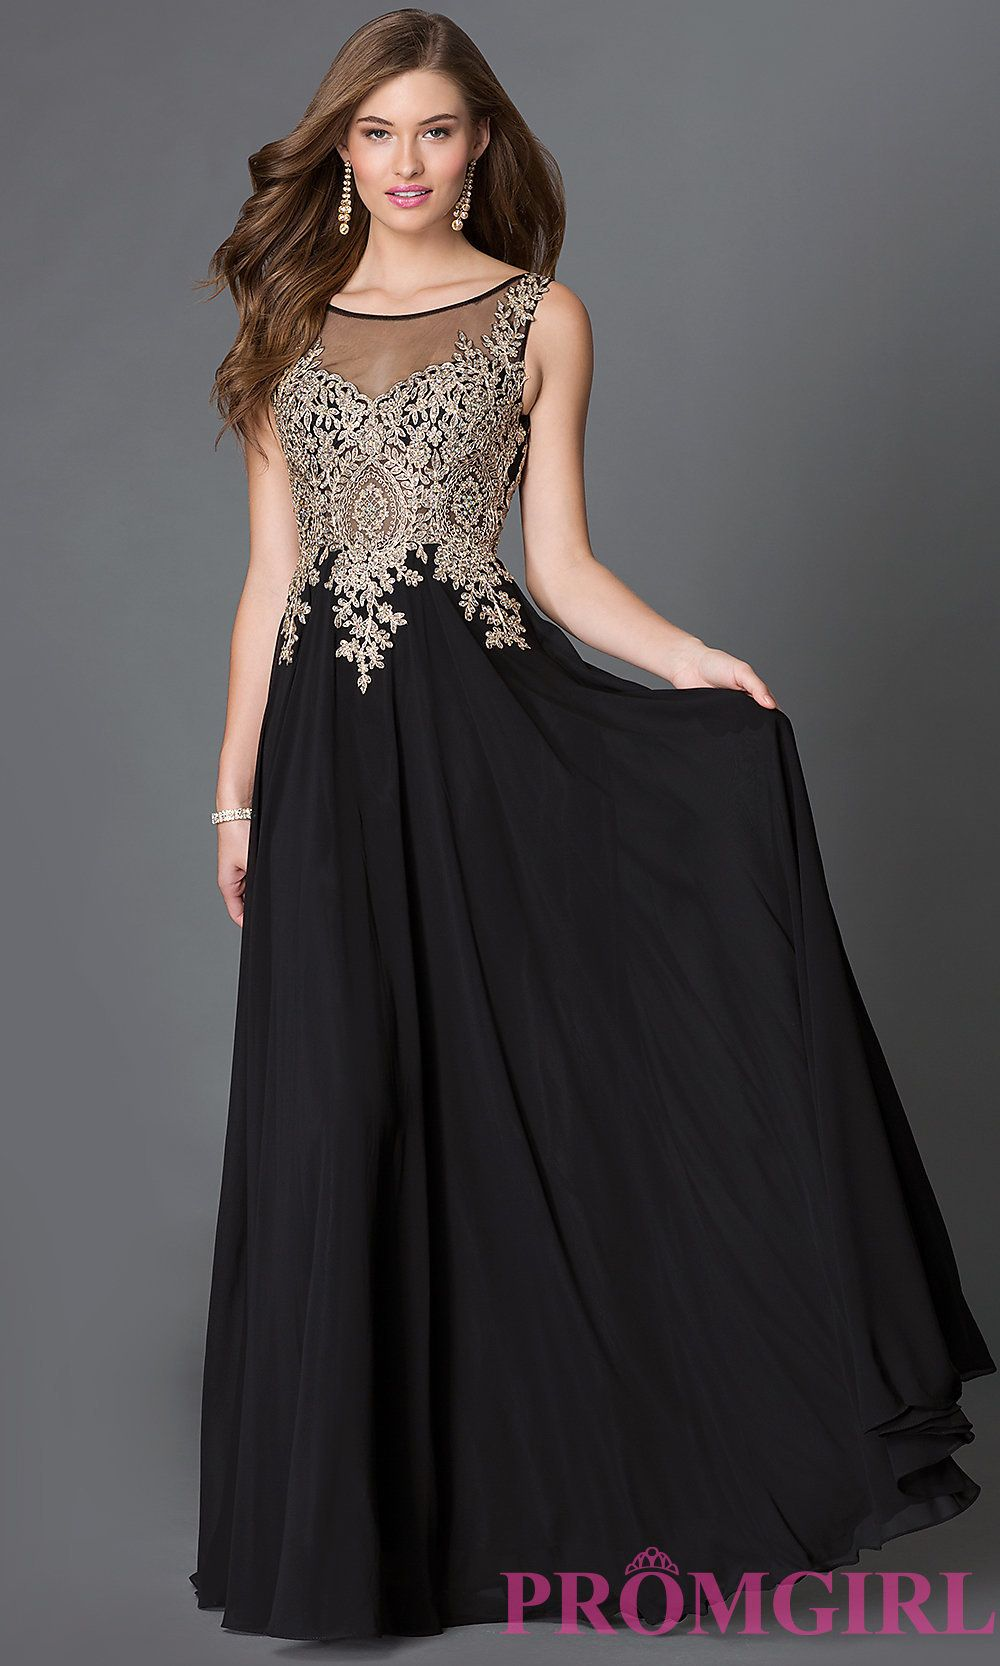 Jewel embellished sheer back chiffon prom dress in beautiful